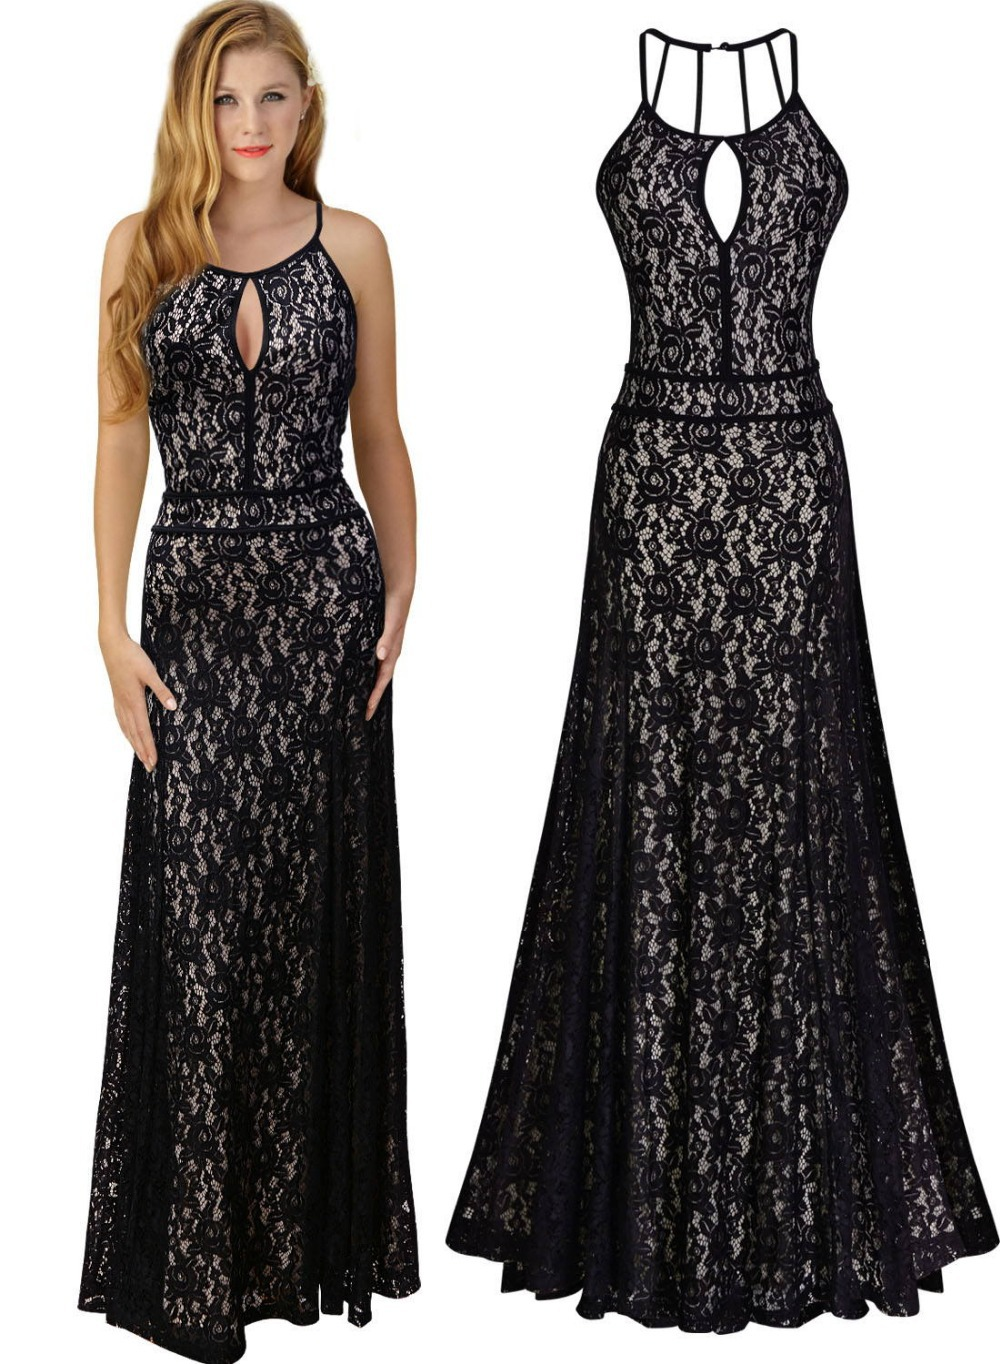 5c746cb27fa Long Party Dresses At Macys - Data Dynamic AG